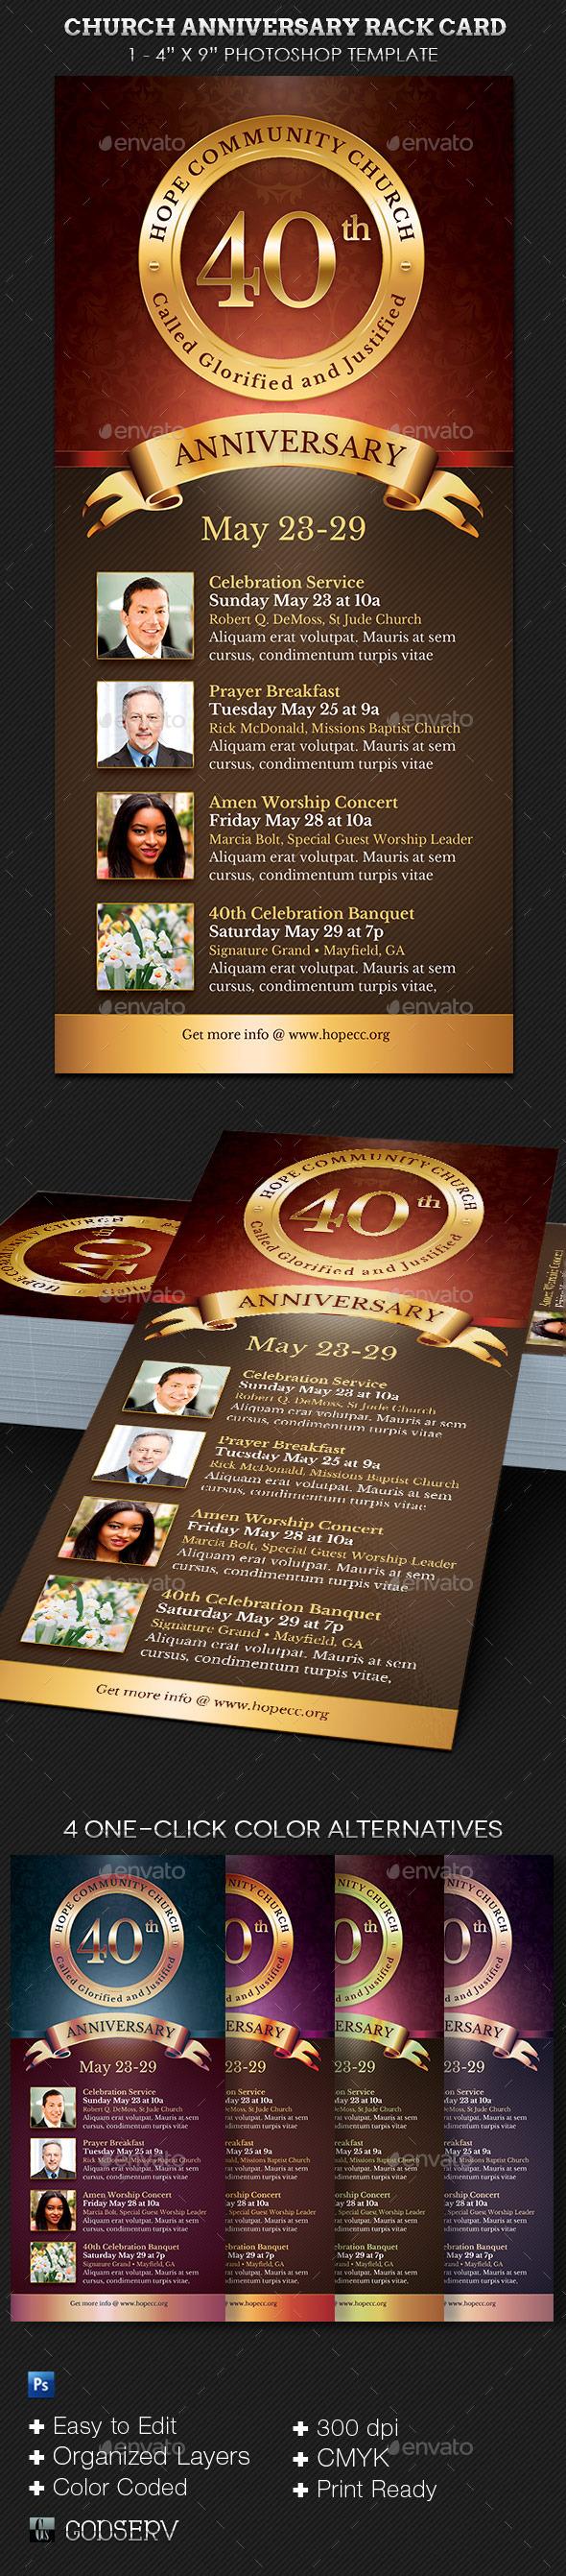 Church Anniversary Rack Card Template - Church Flyers